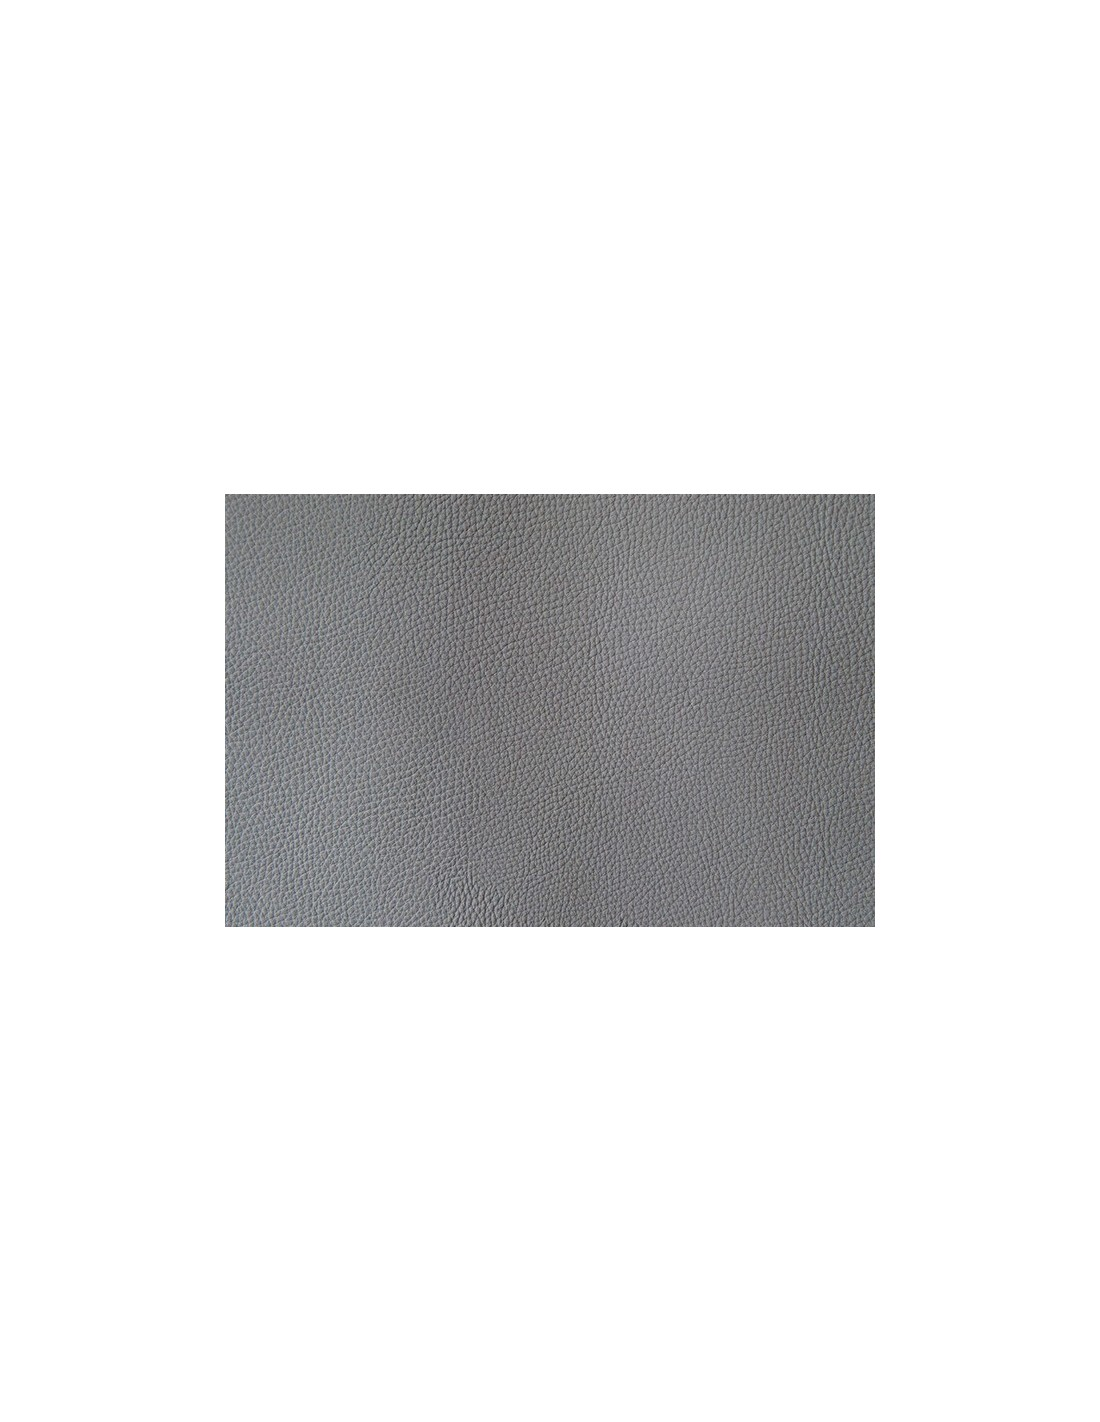 366 Metal Armchair, Eco-Leather